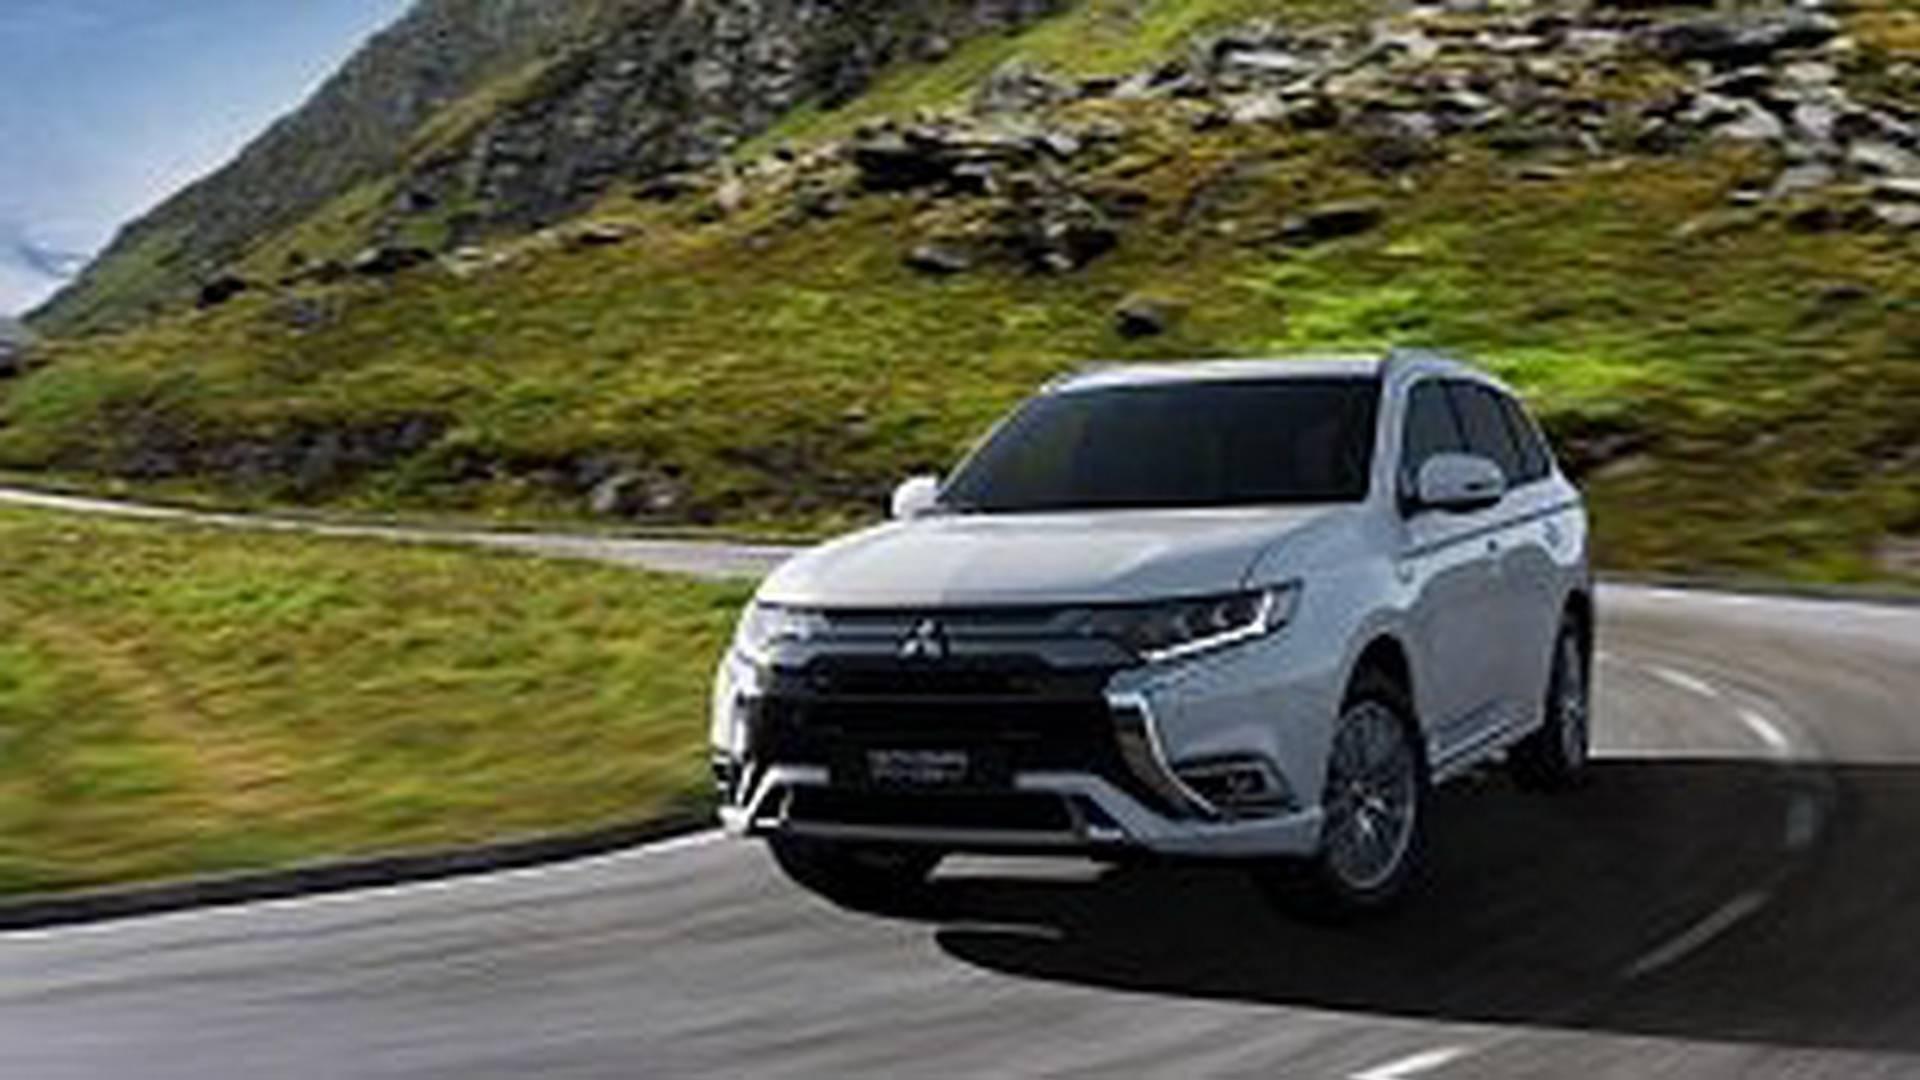 Mitsubishi Outlander PHEV is still Britain's most popular plug-in